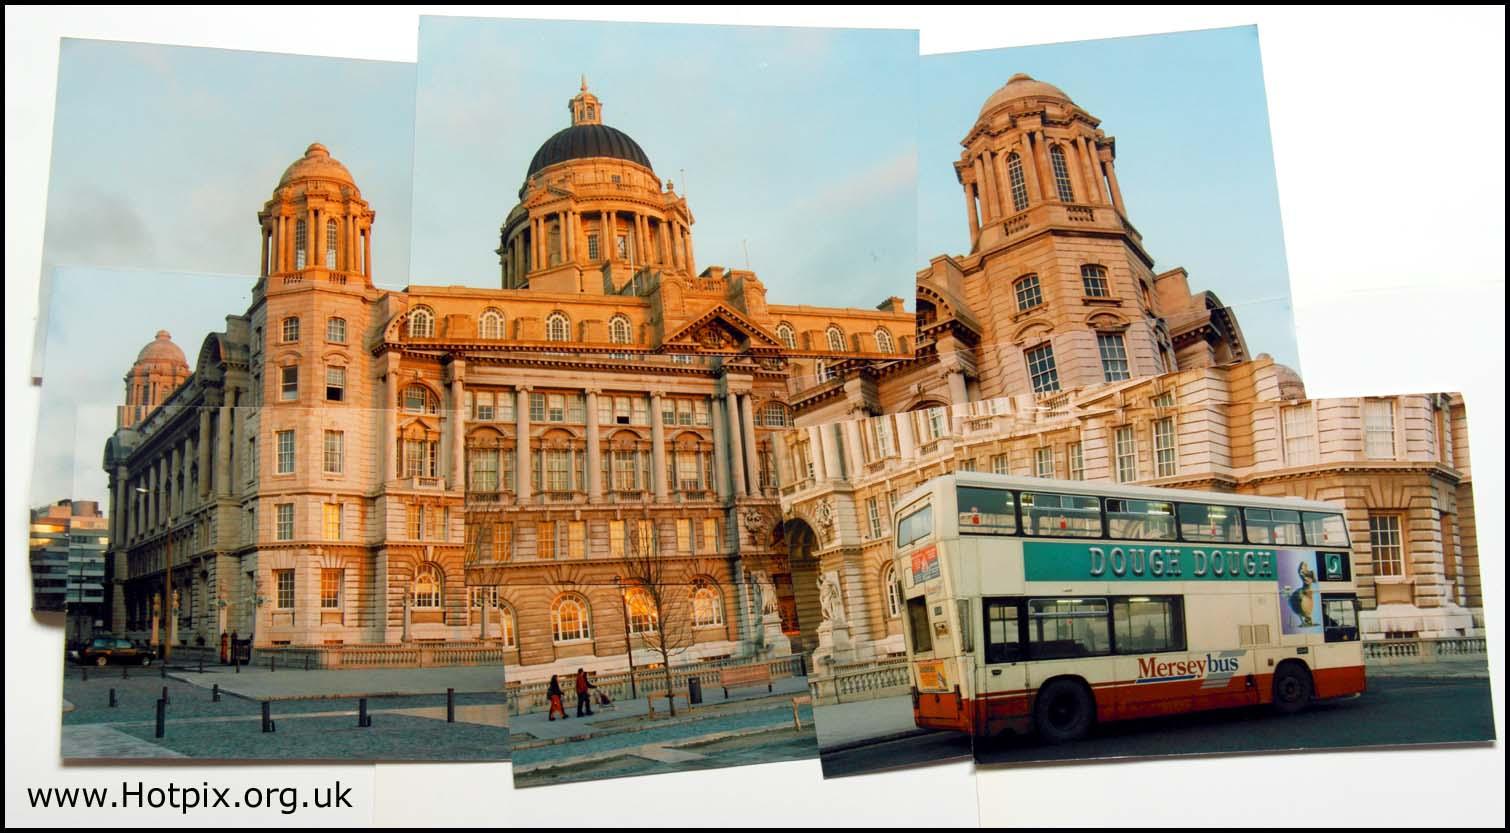 Liverpool,three,graces,dock,side,dockside,peir,pier,head,pierhead,bus,merseybus,mersey,panorama,joiner,hockney,david,hotpix,hotpixuk,tony,smith,tonysmith,England,UK,GB,britain,beatles,the beatles,liver,building,city,town,hotpics,hotpic,hotpick,hotpicks,hot,pics,pix,picks,highway,road,hotpix.freeserve.co.uk,buildings,built,architecture,merseyside,pano,stitched,join,joined,images,widescreen,wide,\u043f\u0430\u043d\u043e\u0440\u0430\u043c\u0430,\u30d1\u30ce\u30e9\u30de,\u5168\u666f,\ud55c\uad6d\uc5b4